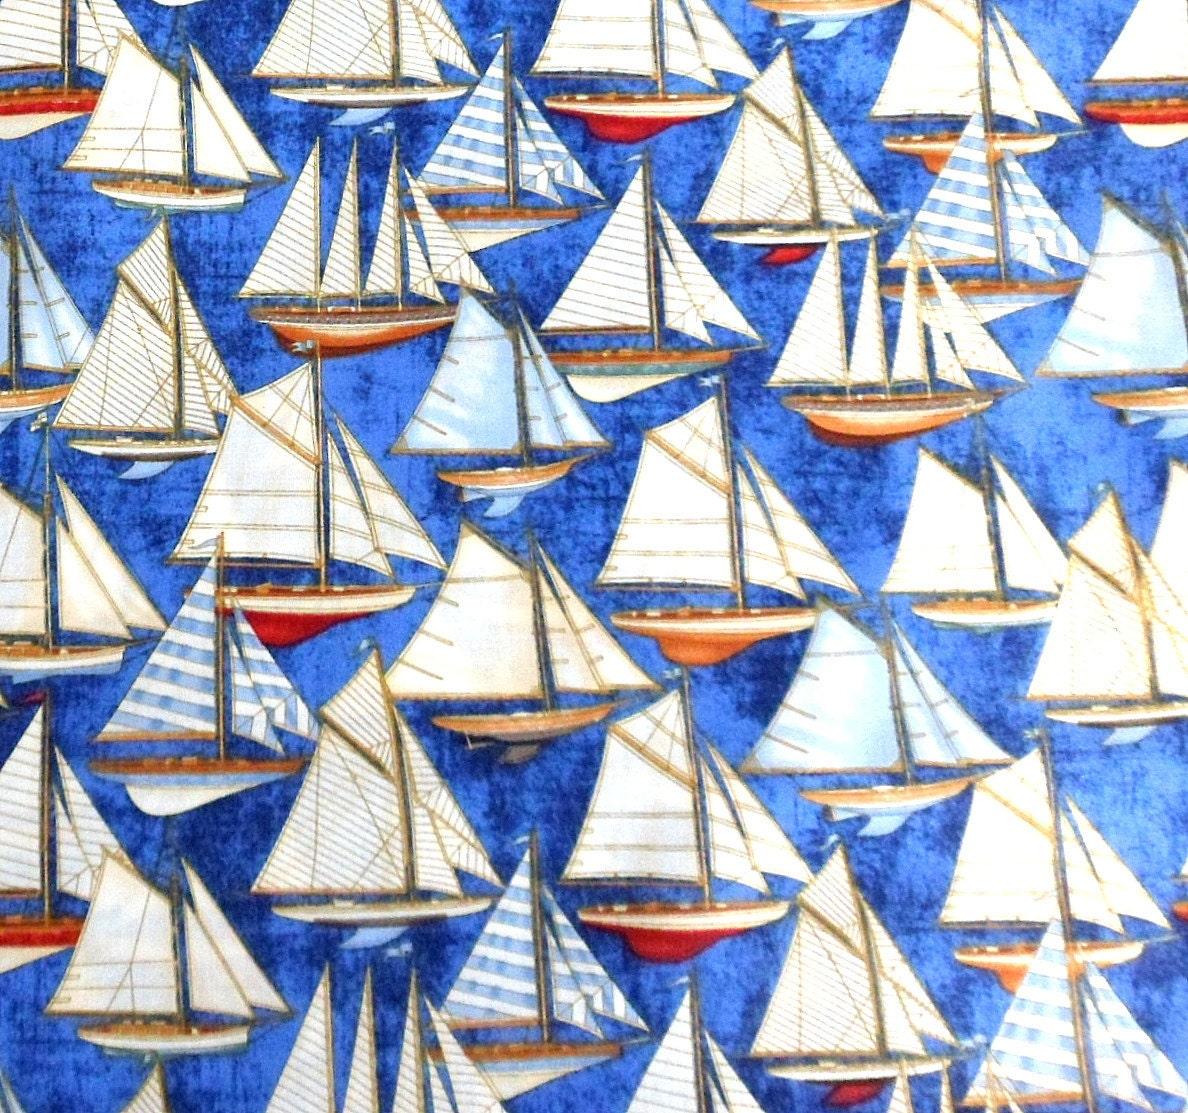 Sailboat Fabric Nautical Fabric Sailing Ships Fabric